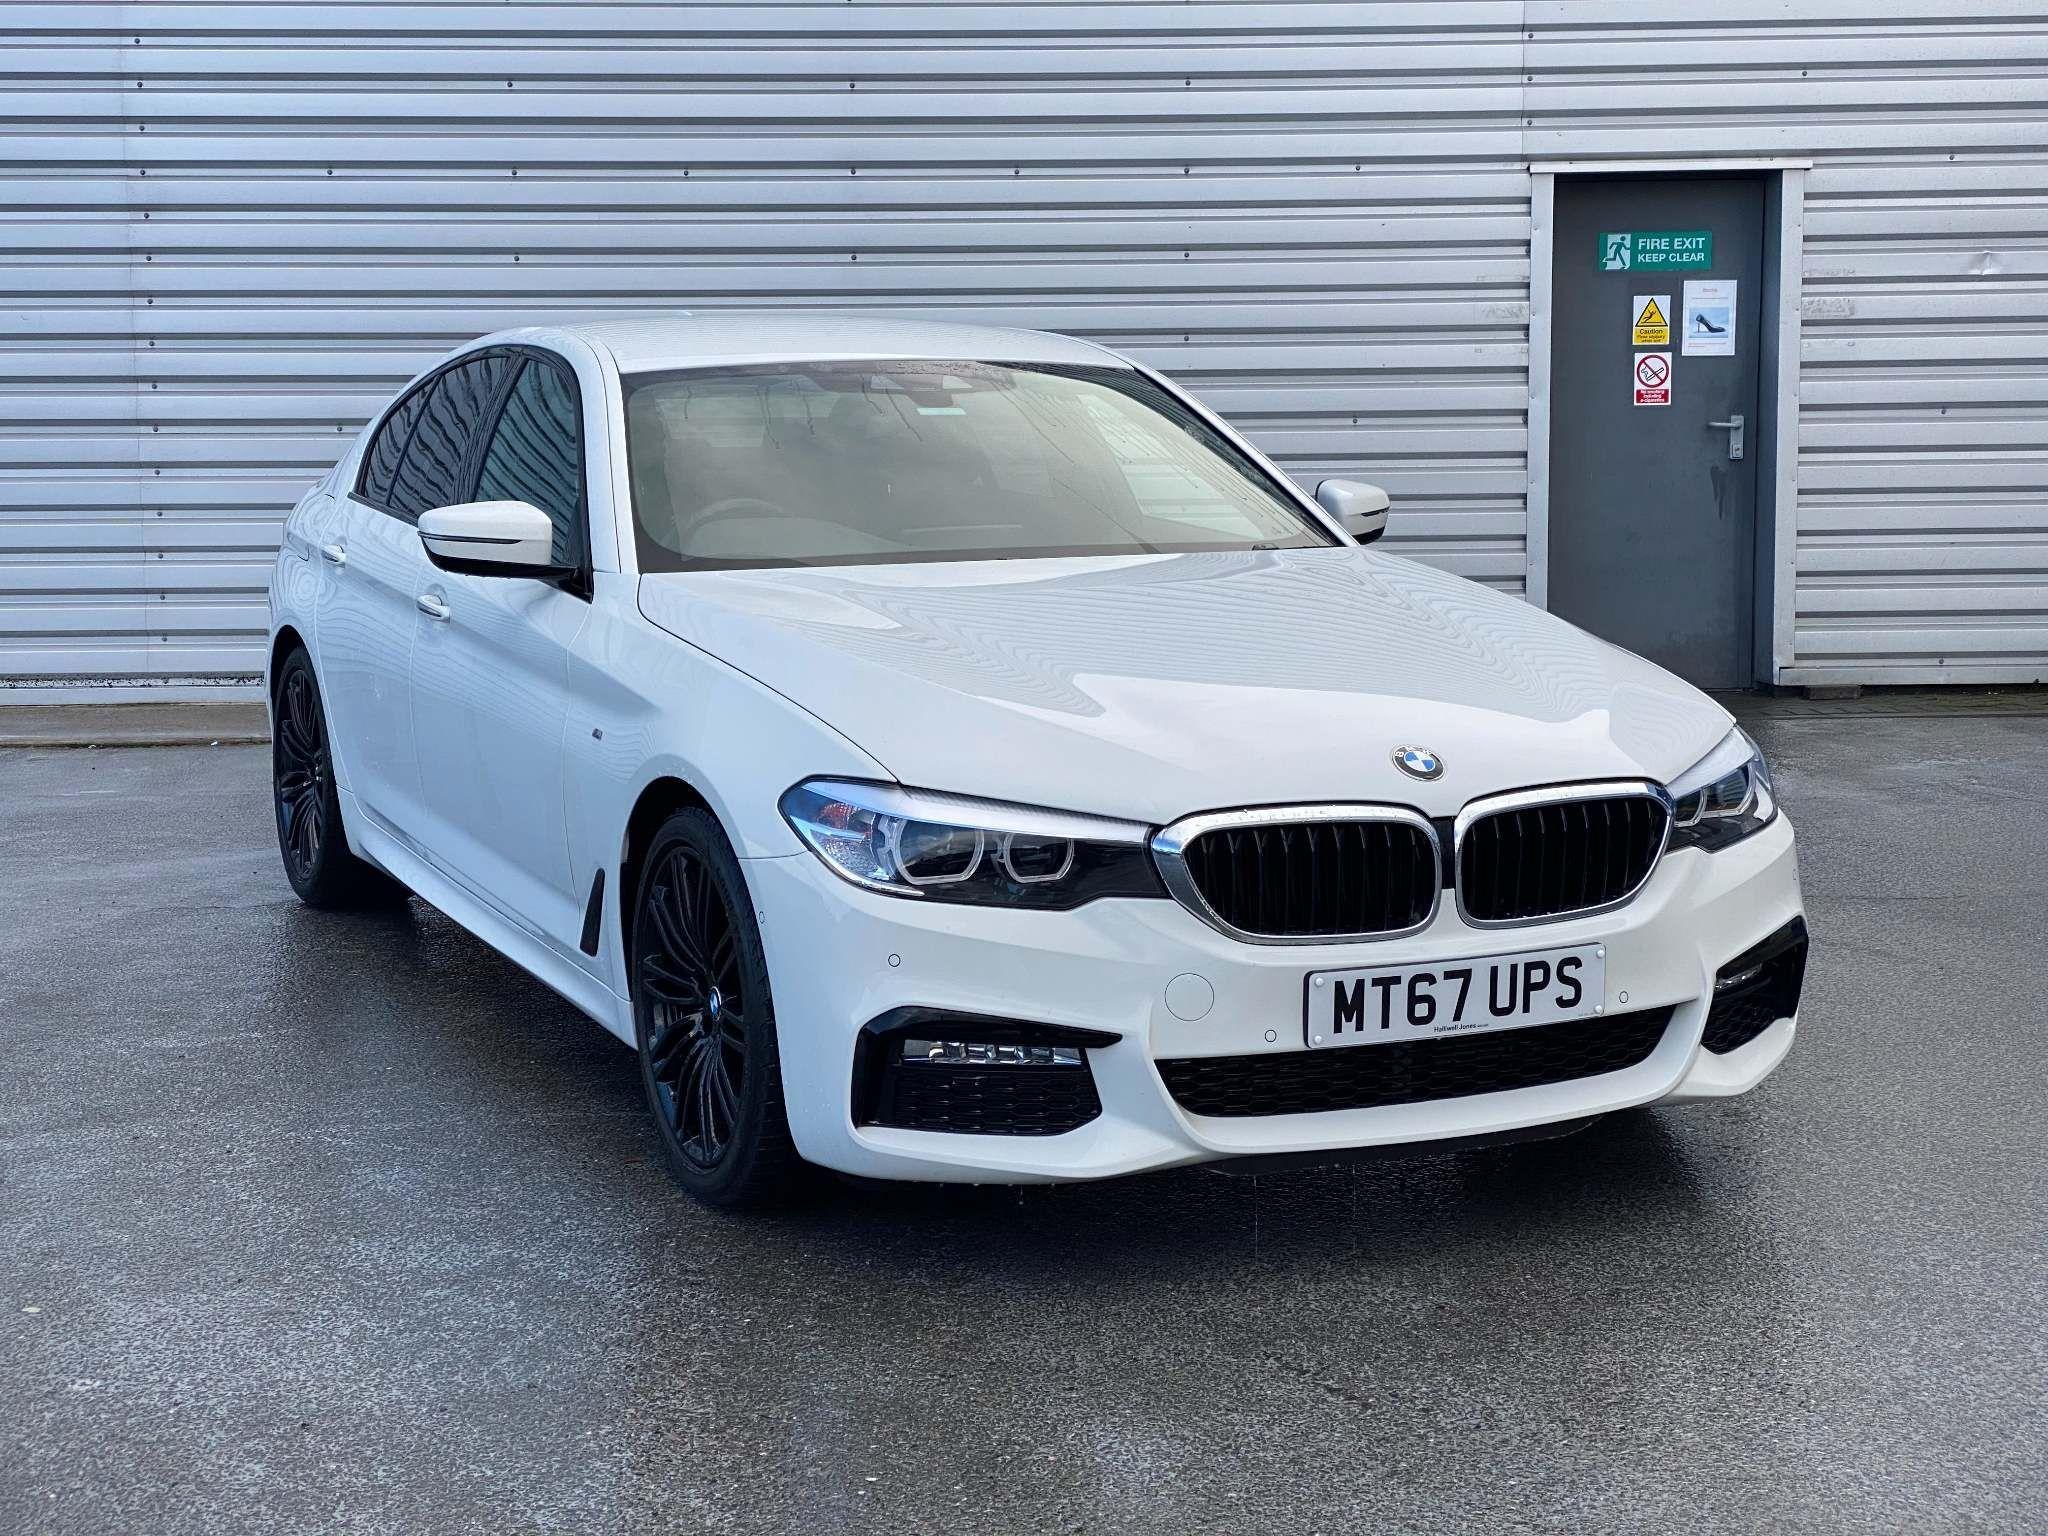 Image 1 - BMW 520d M Sport Saloon (MT67UPS)